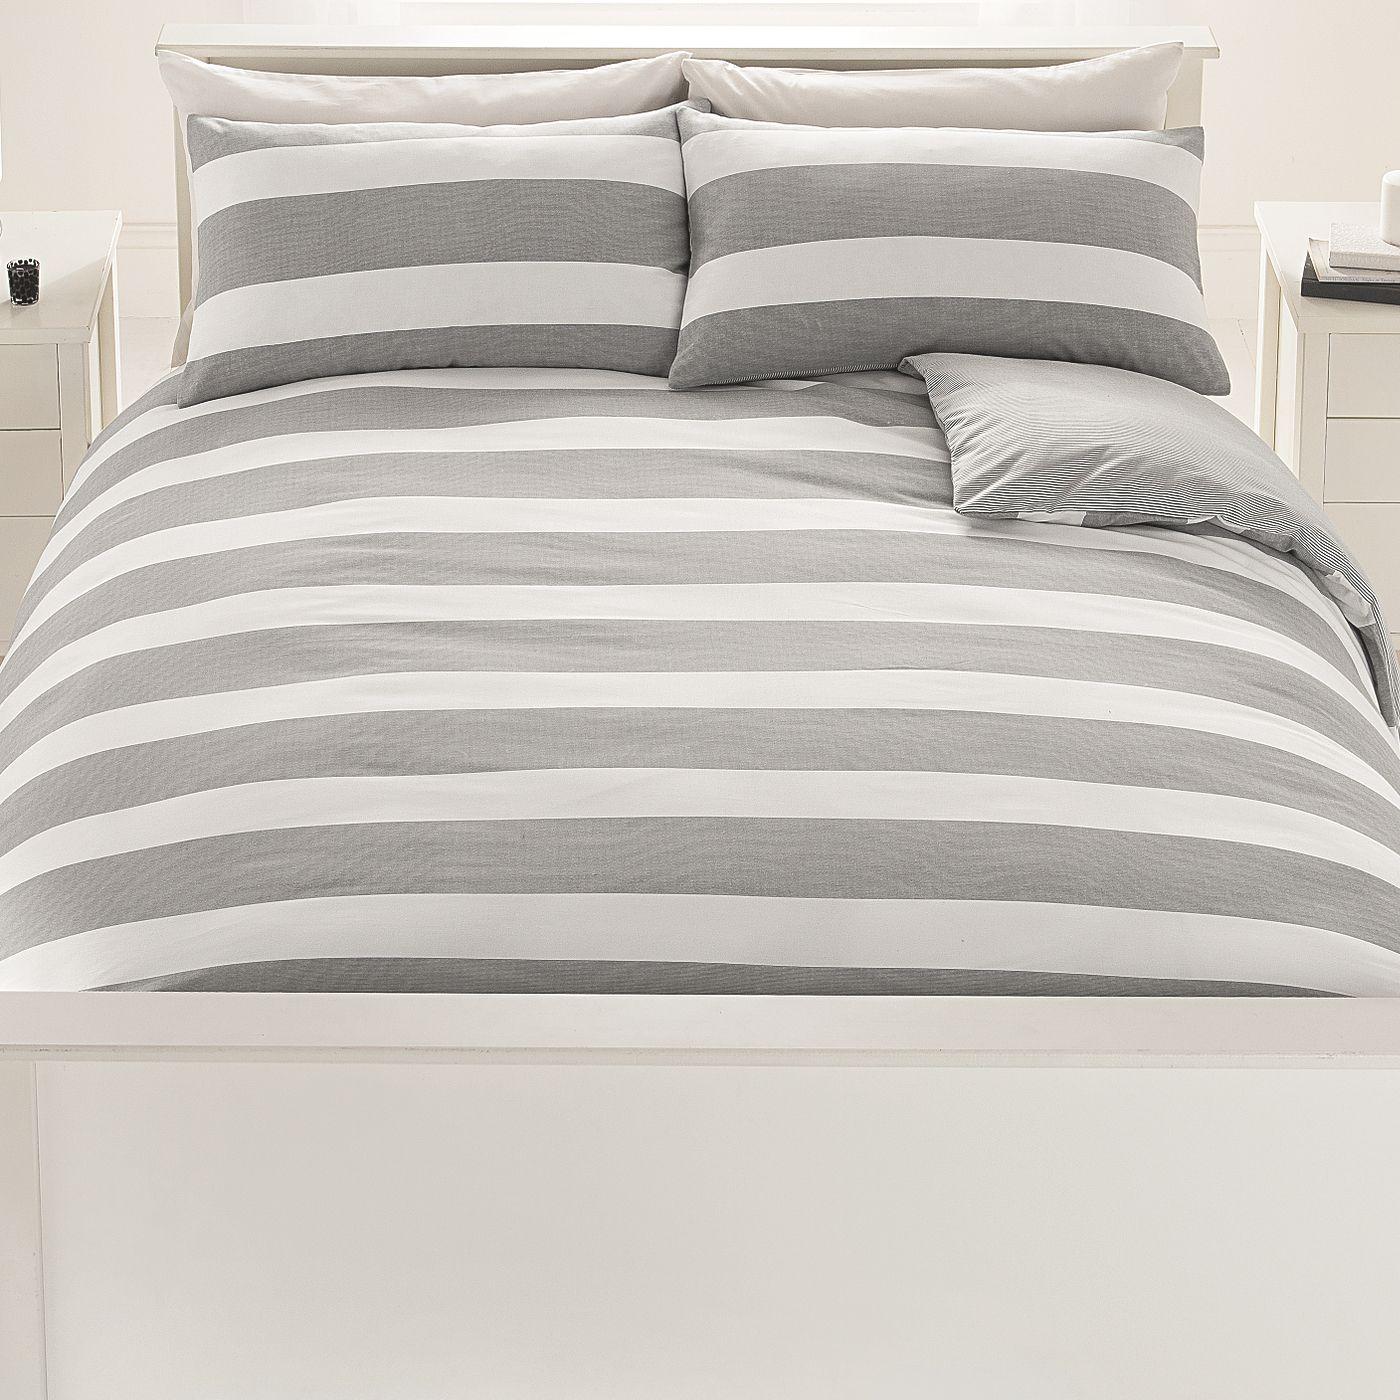 George Home Grey Rugby Stripe Duvet Range Bedding